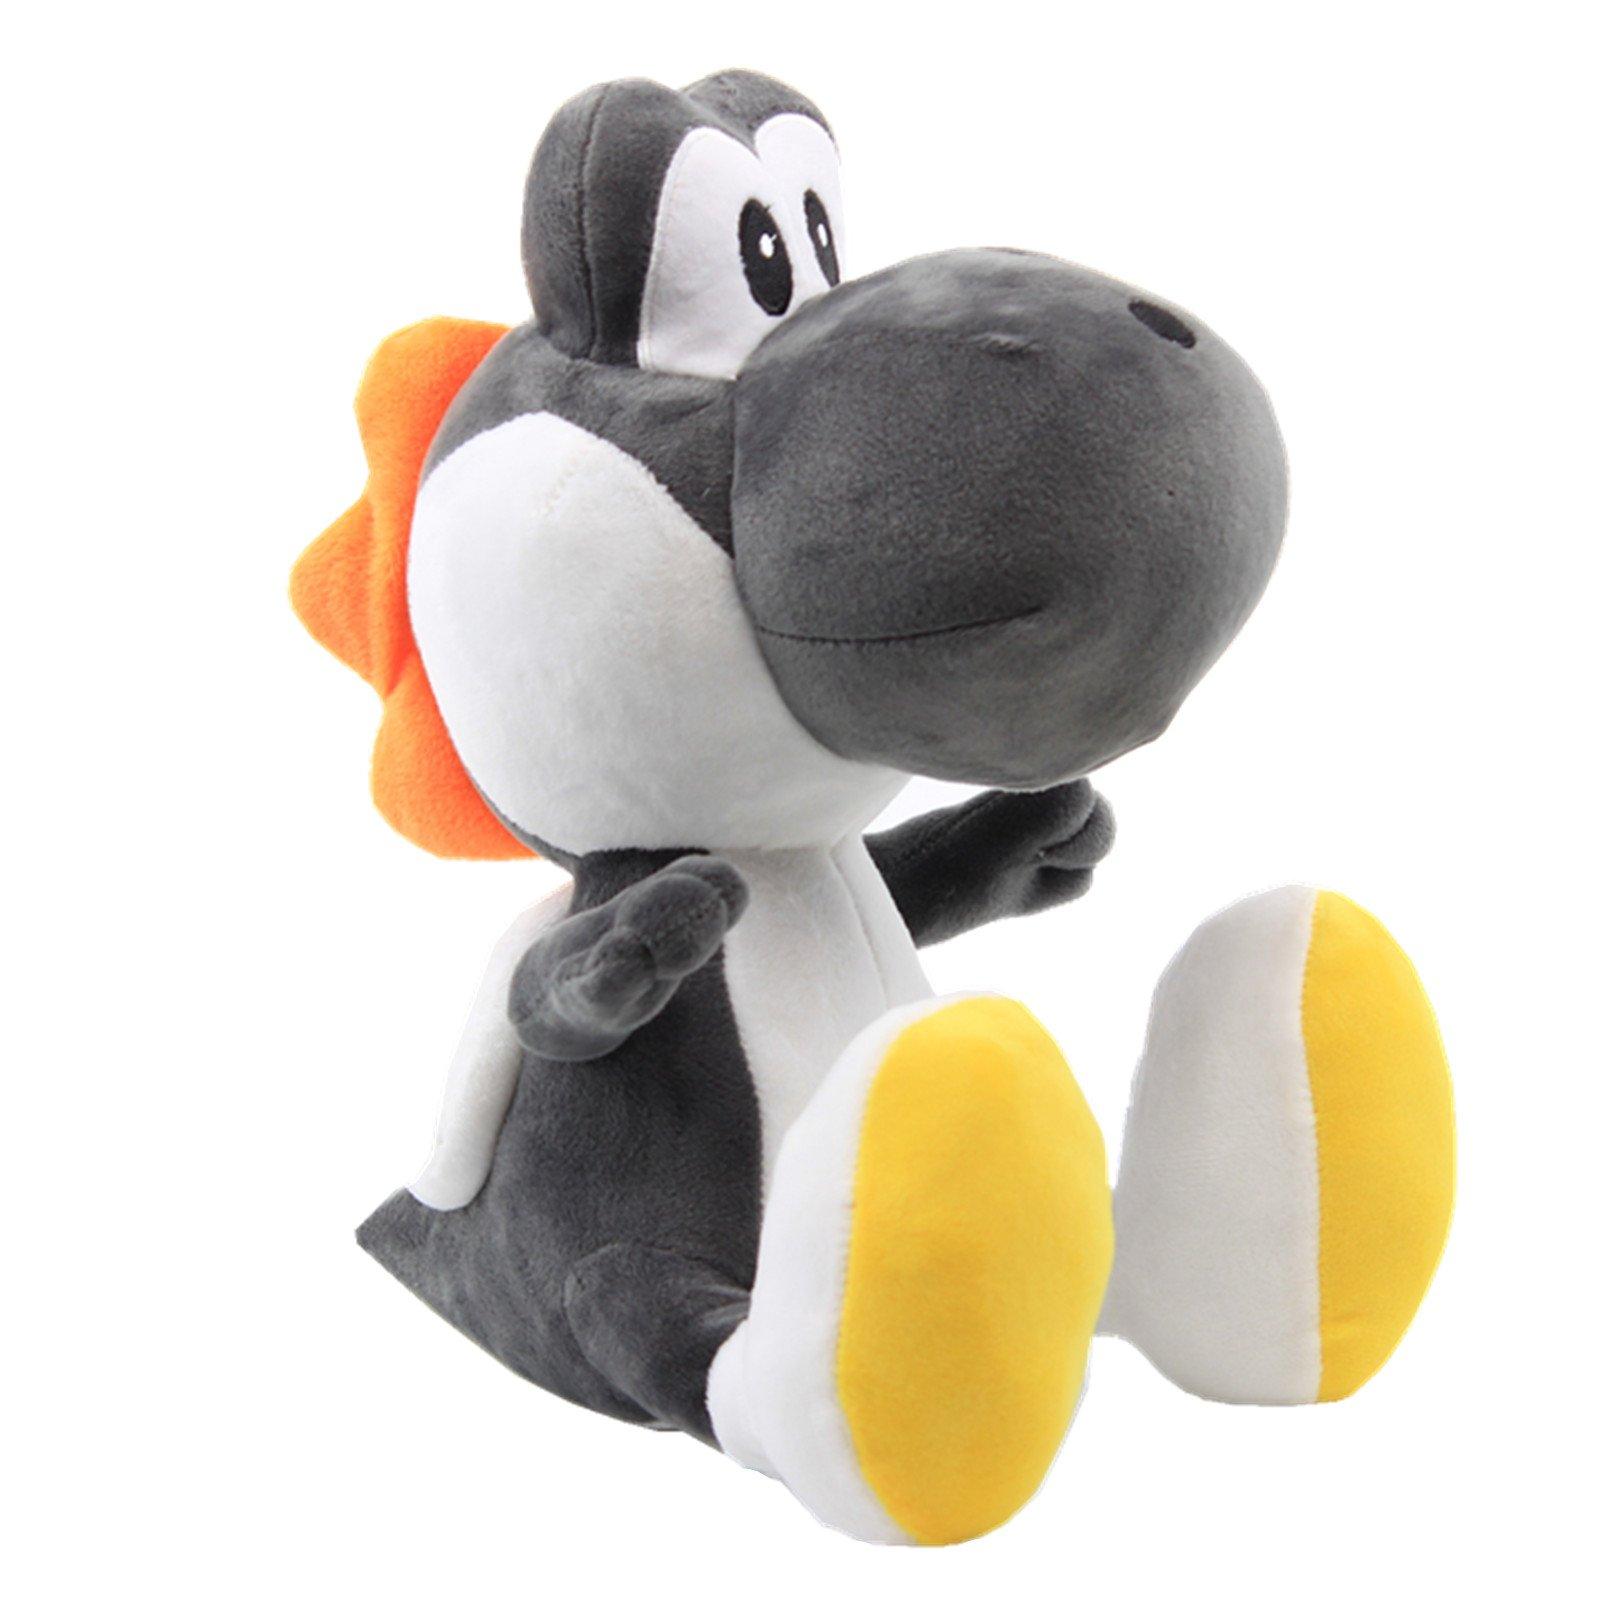 uiuoutoy Super Mario Bros. 12'' Black Yoshi Stuffed Plush by uiuoutoy